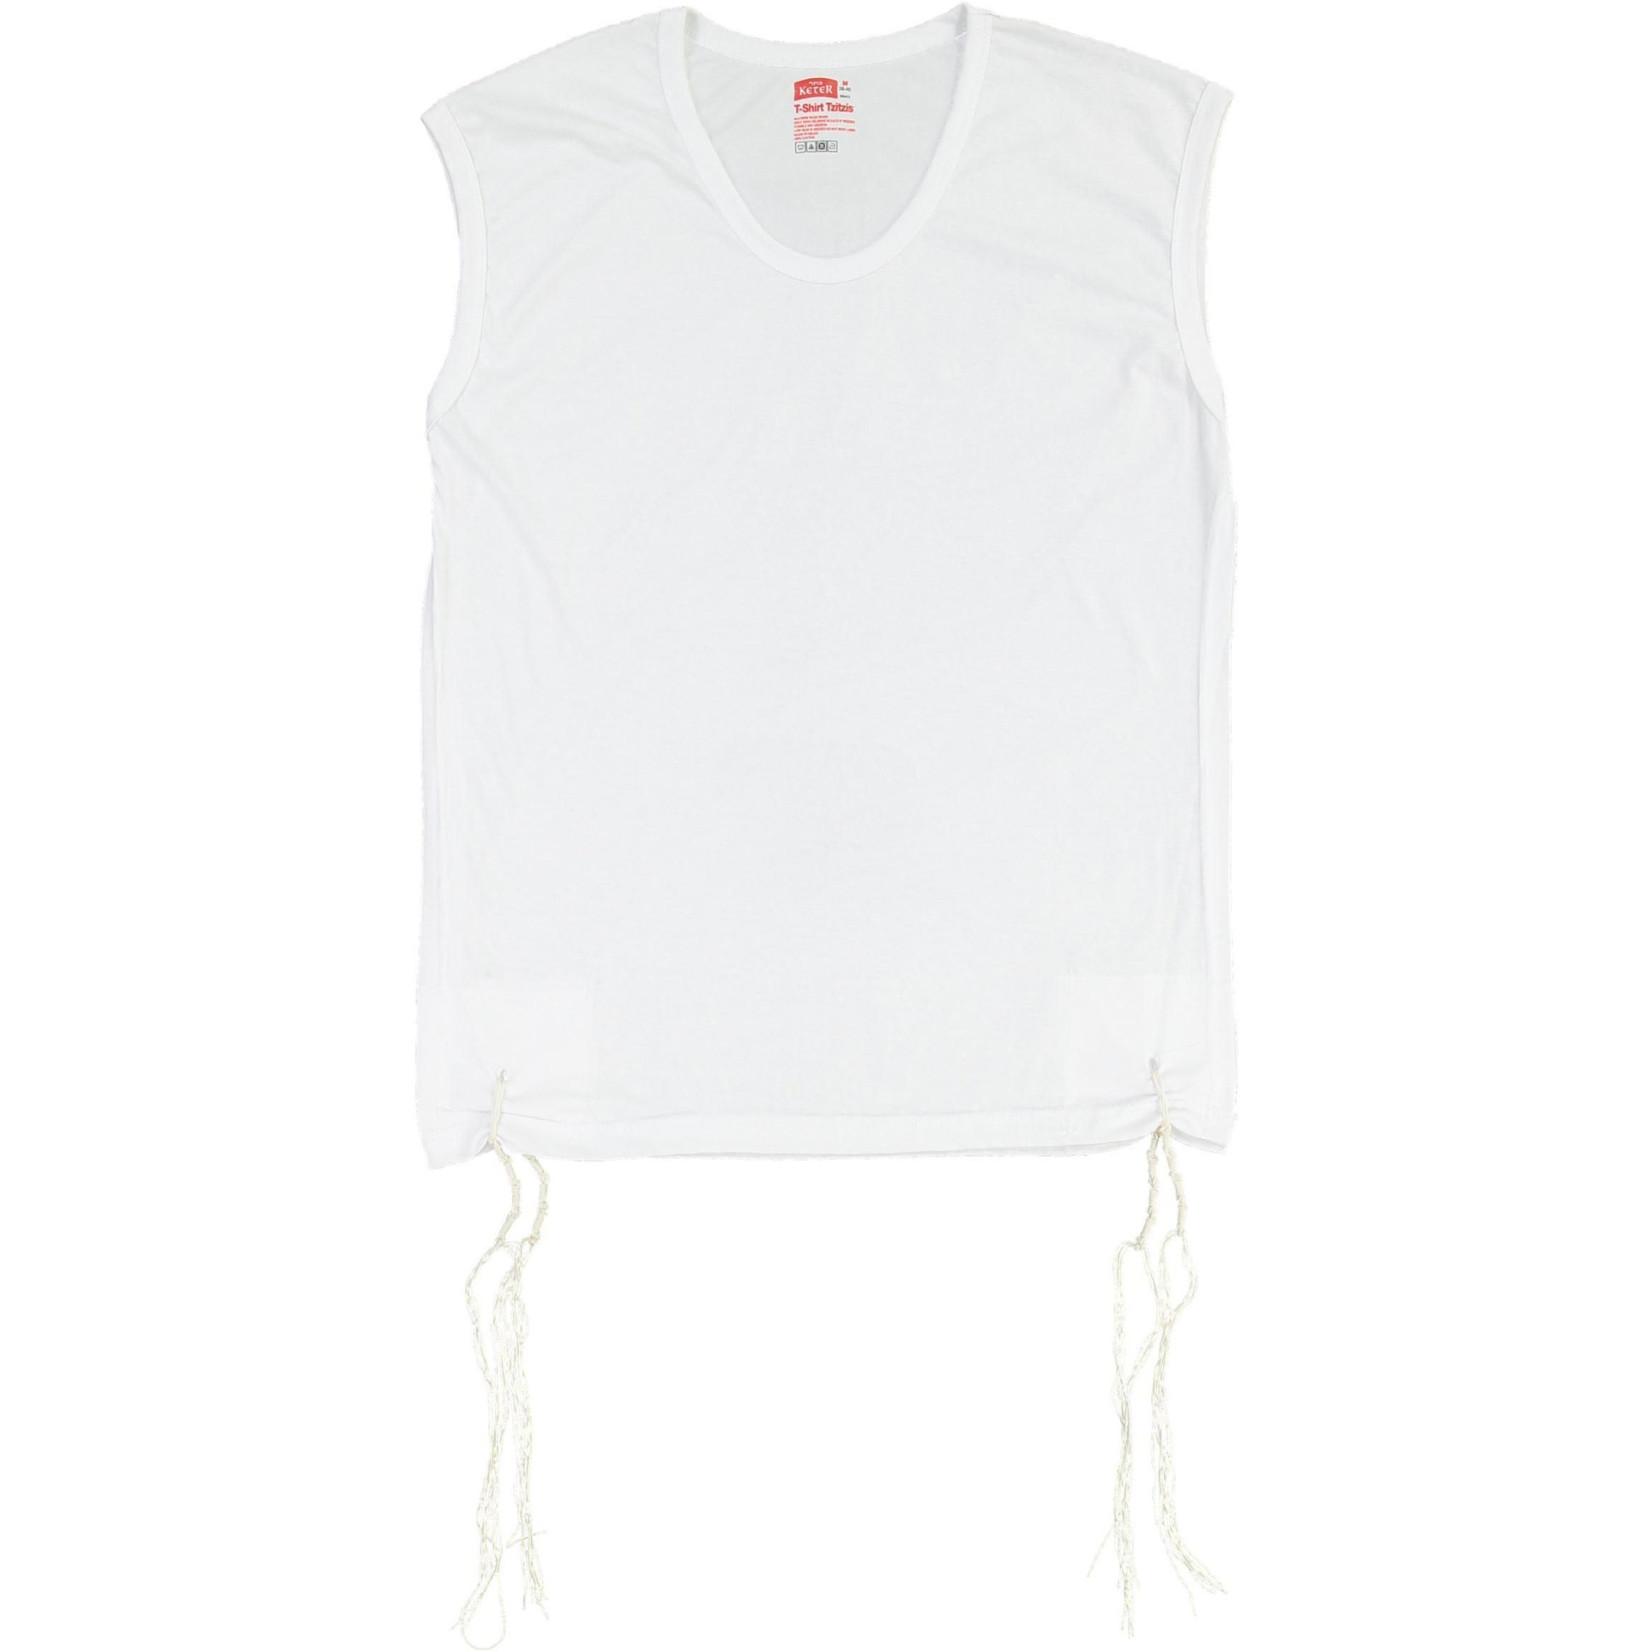 Undershirt-Style Arbah Kanfot, 100% Cotton, Round Neck, Size 4